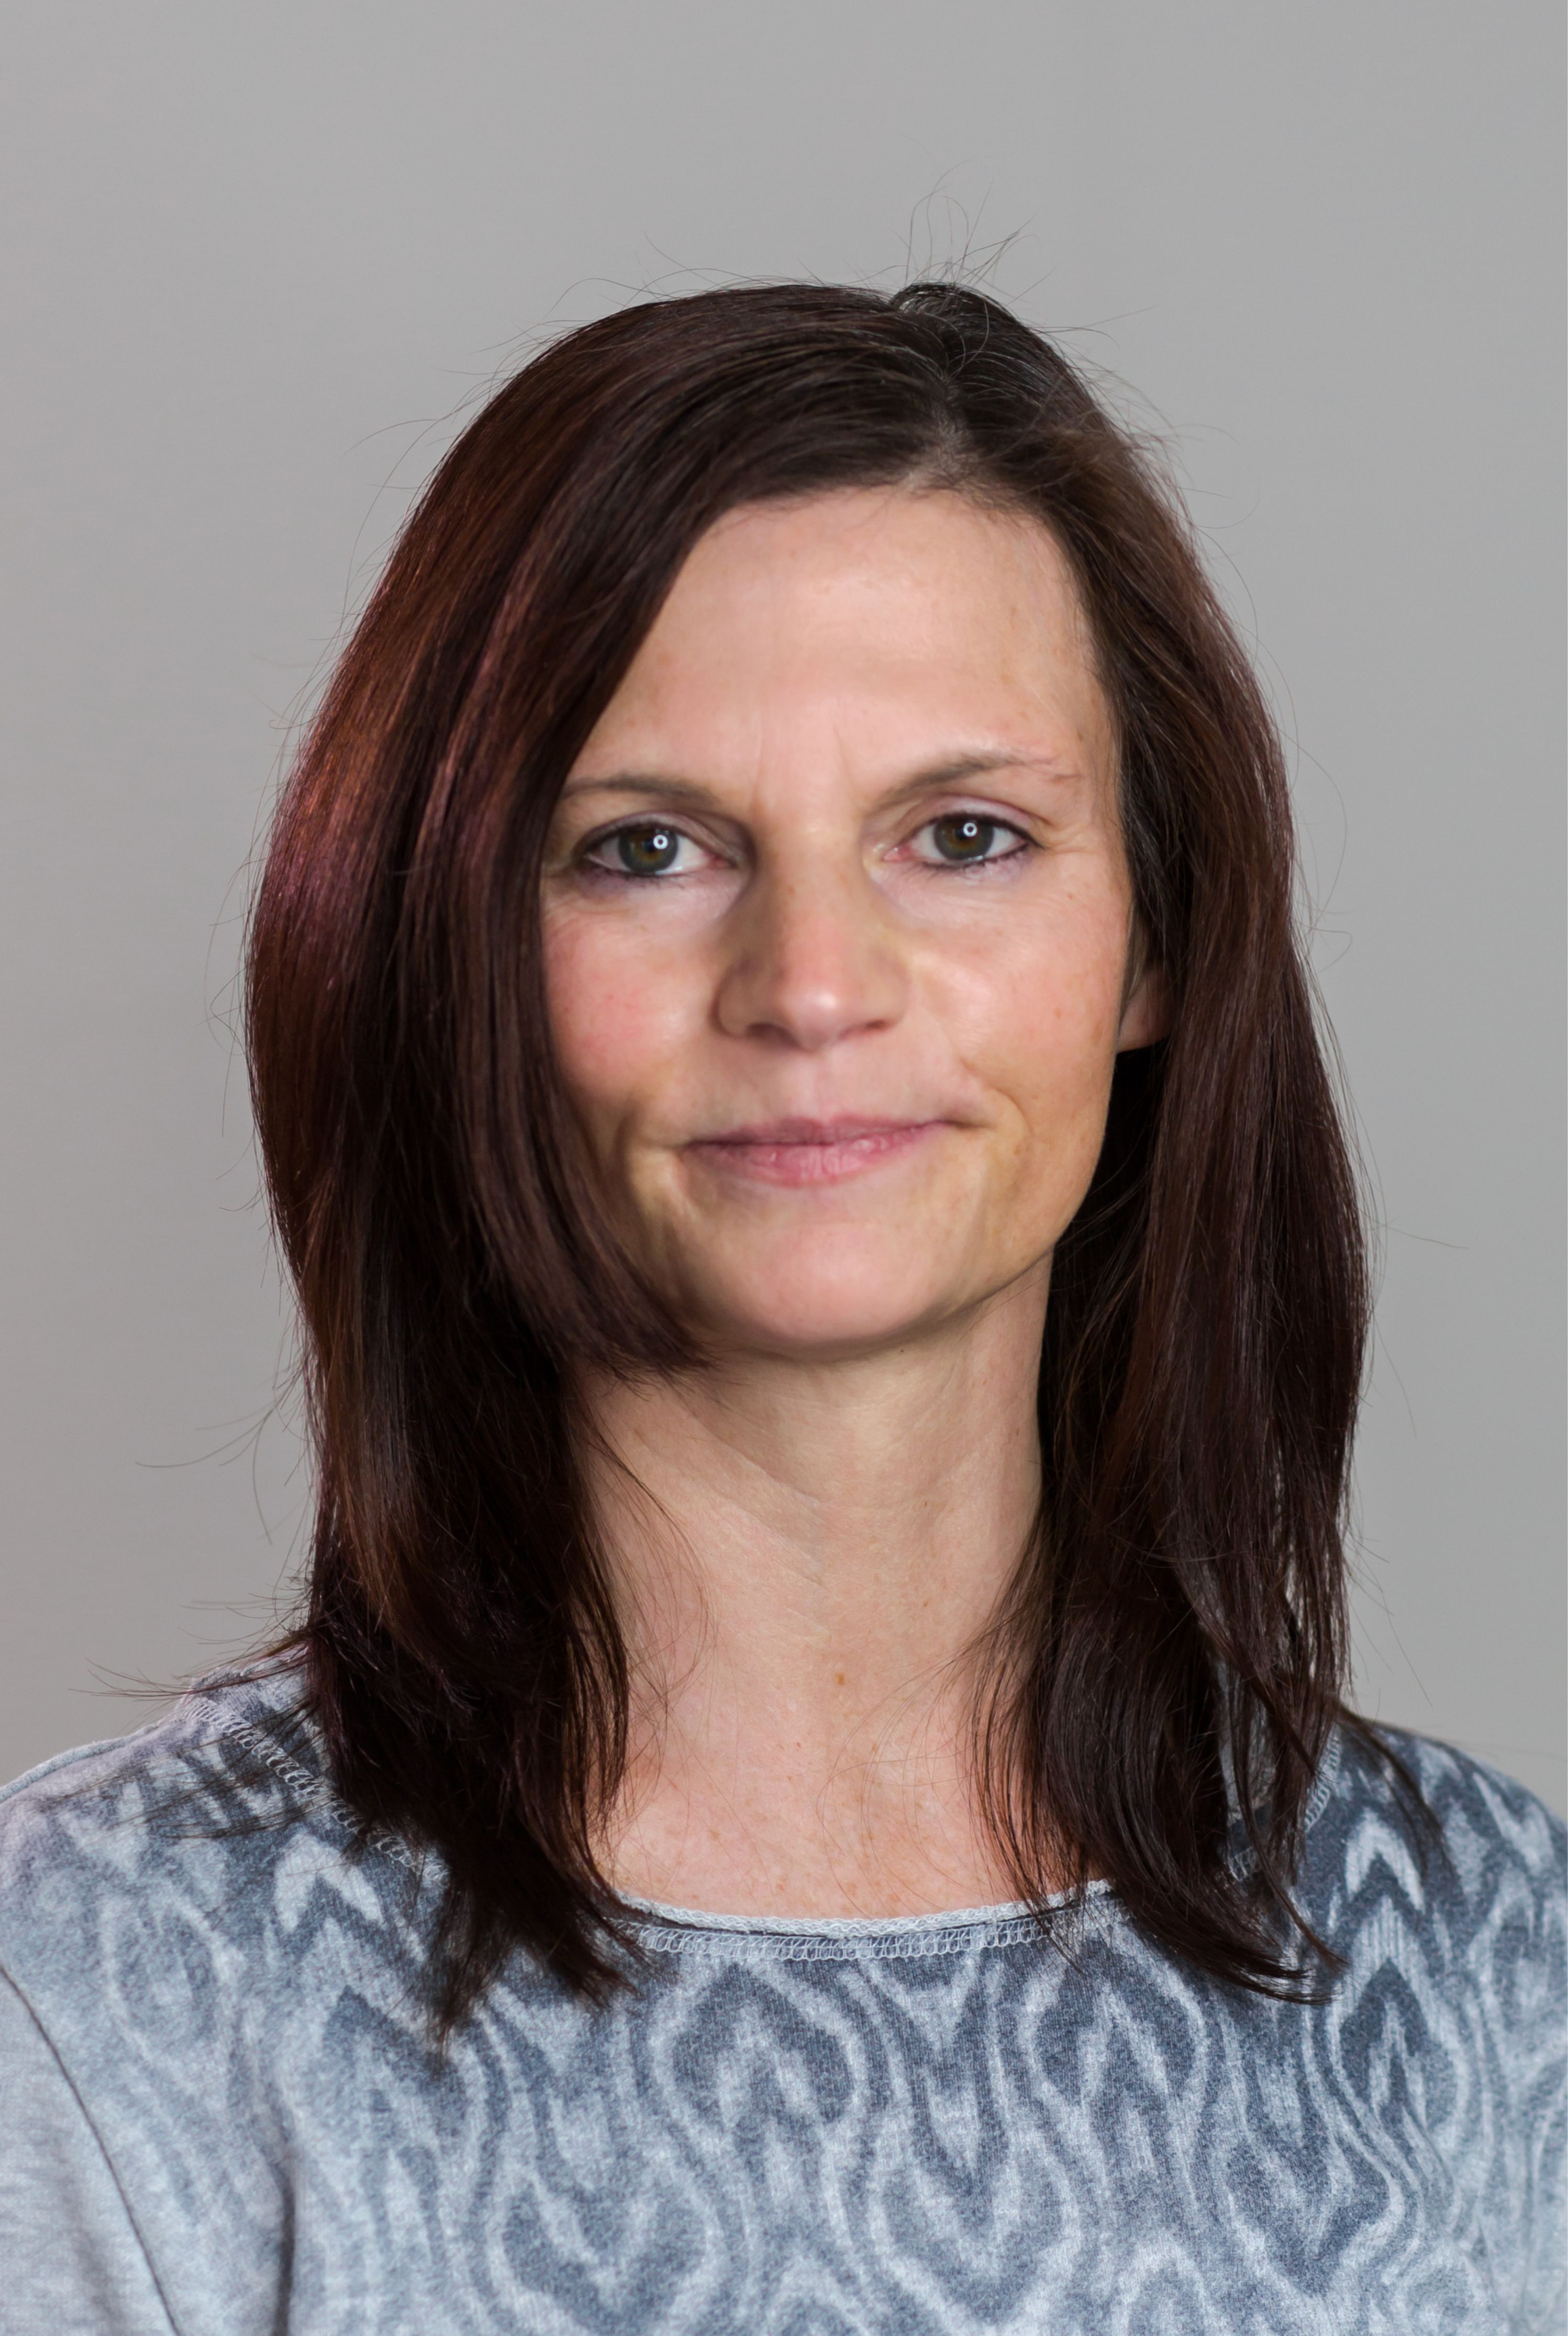 Andrea Enke